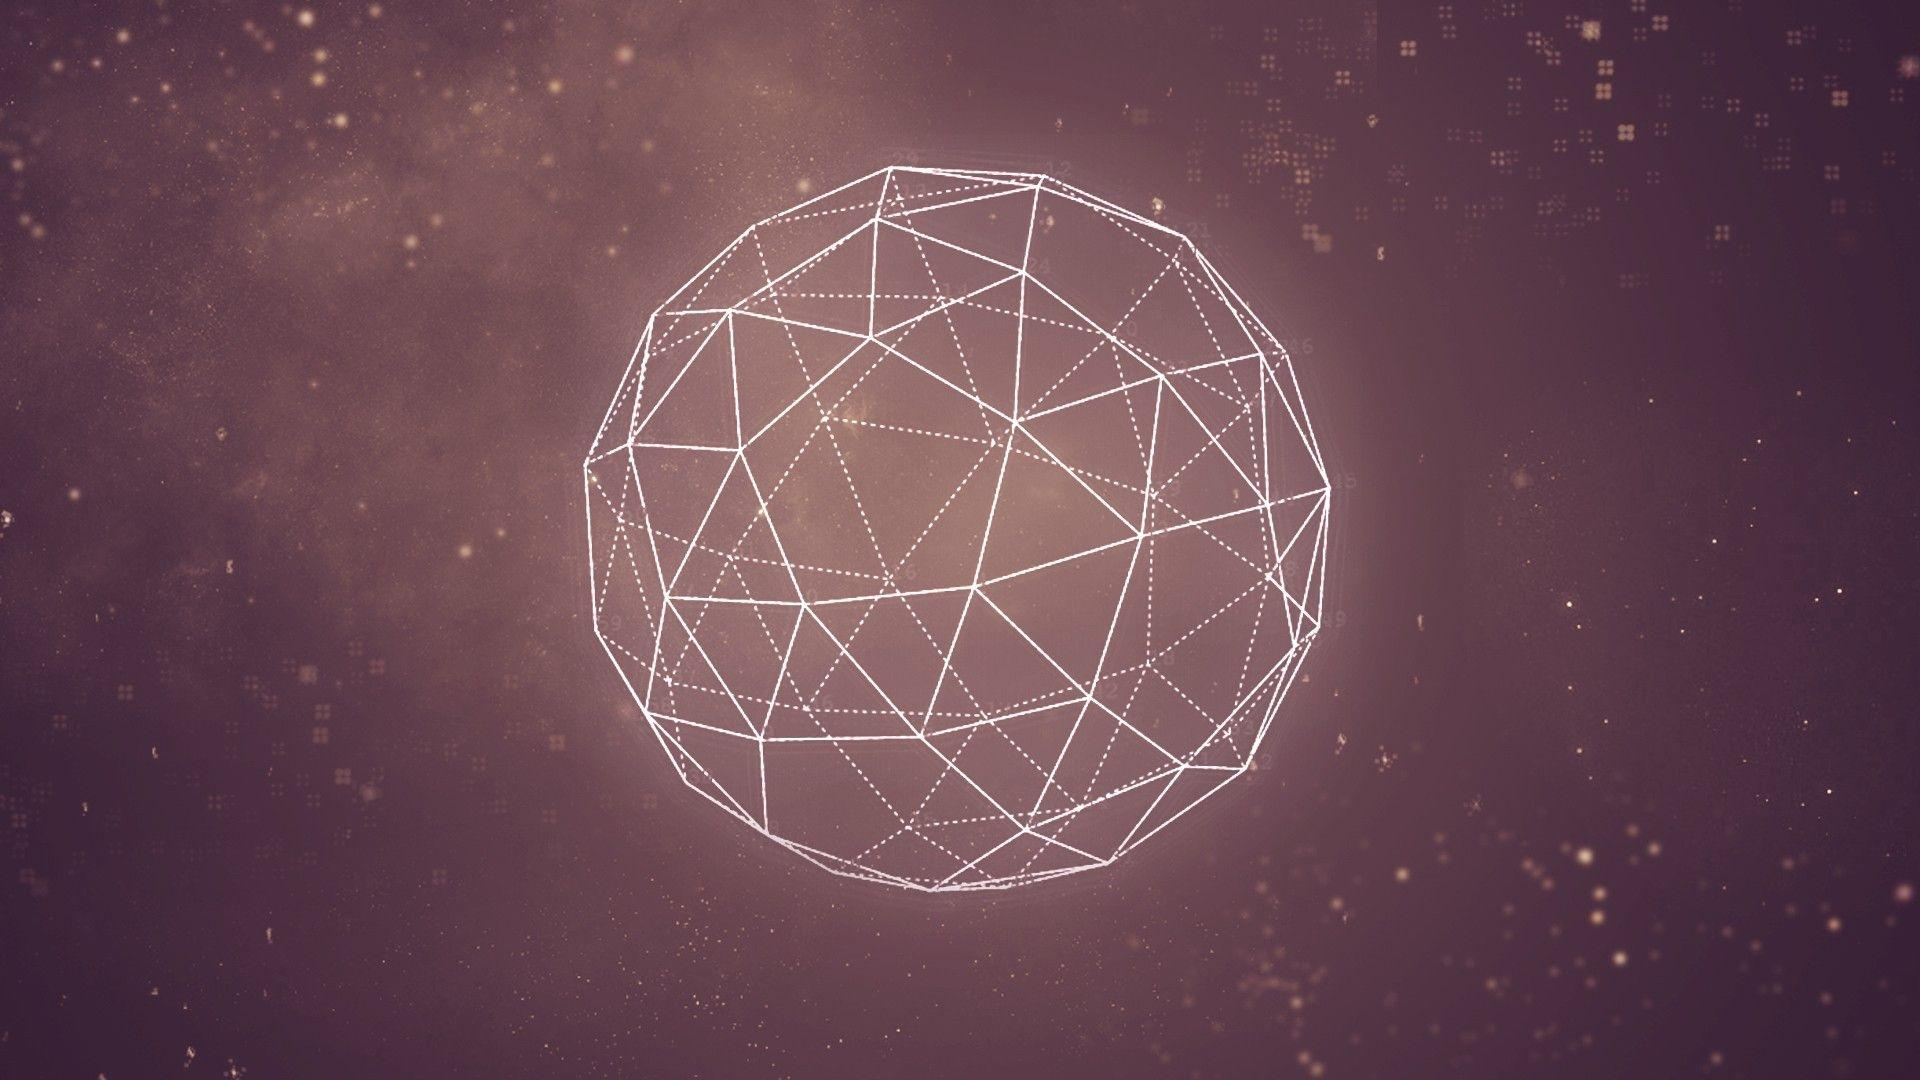 Geometric Wallpaper Photo Album - Home Design Ideas